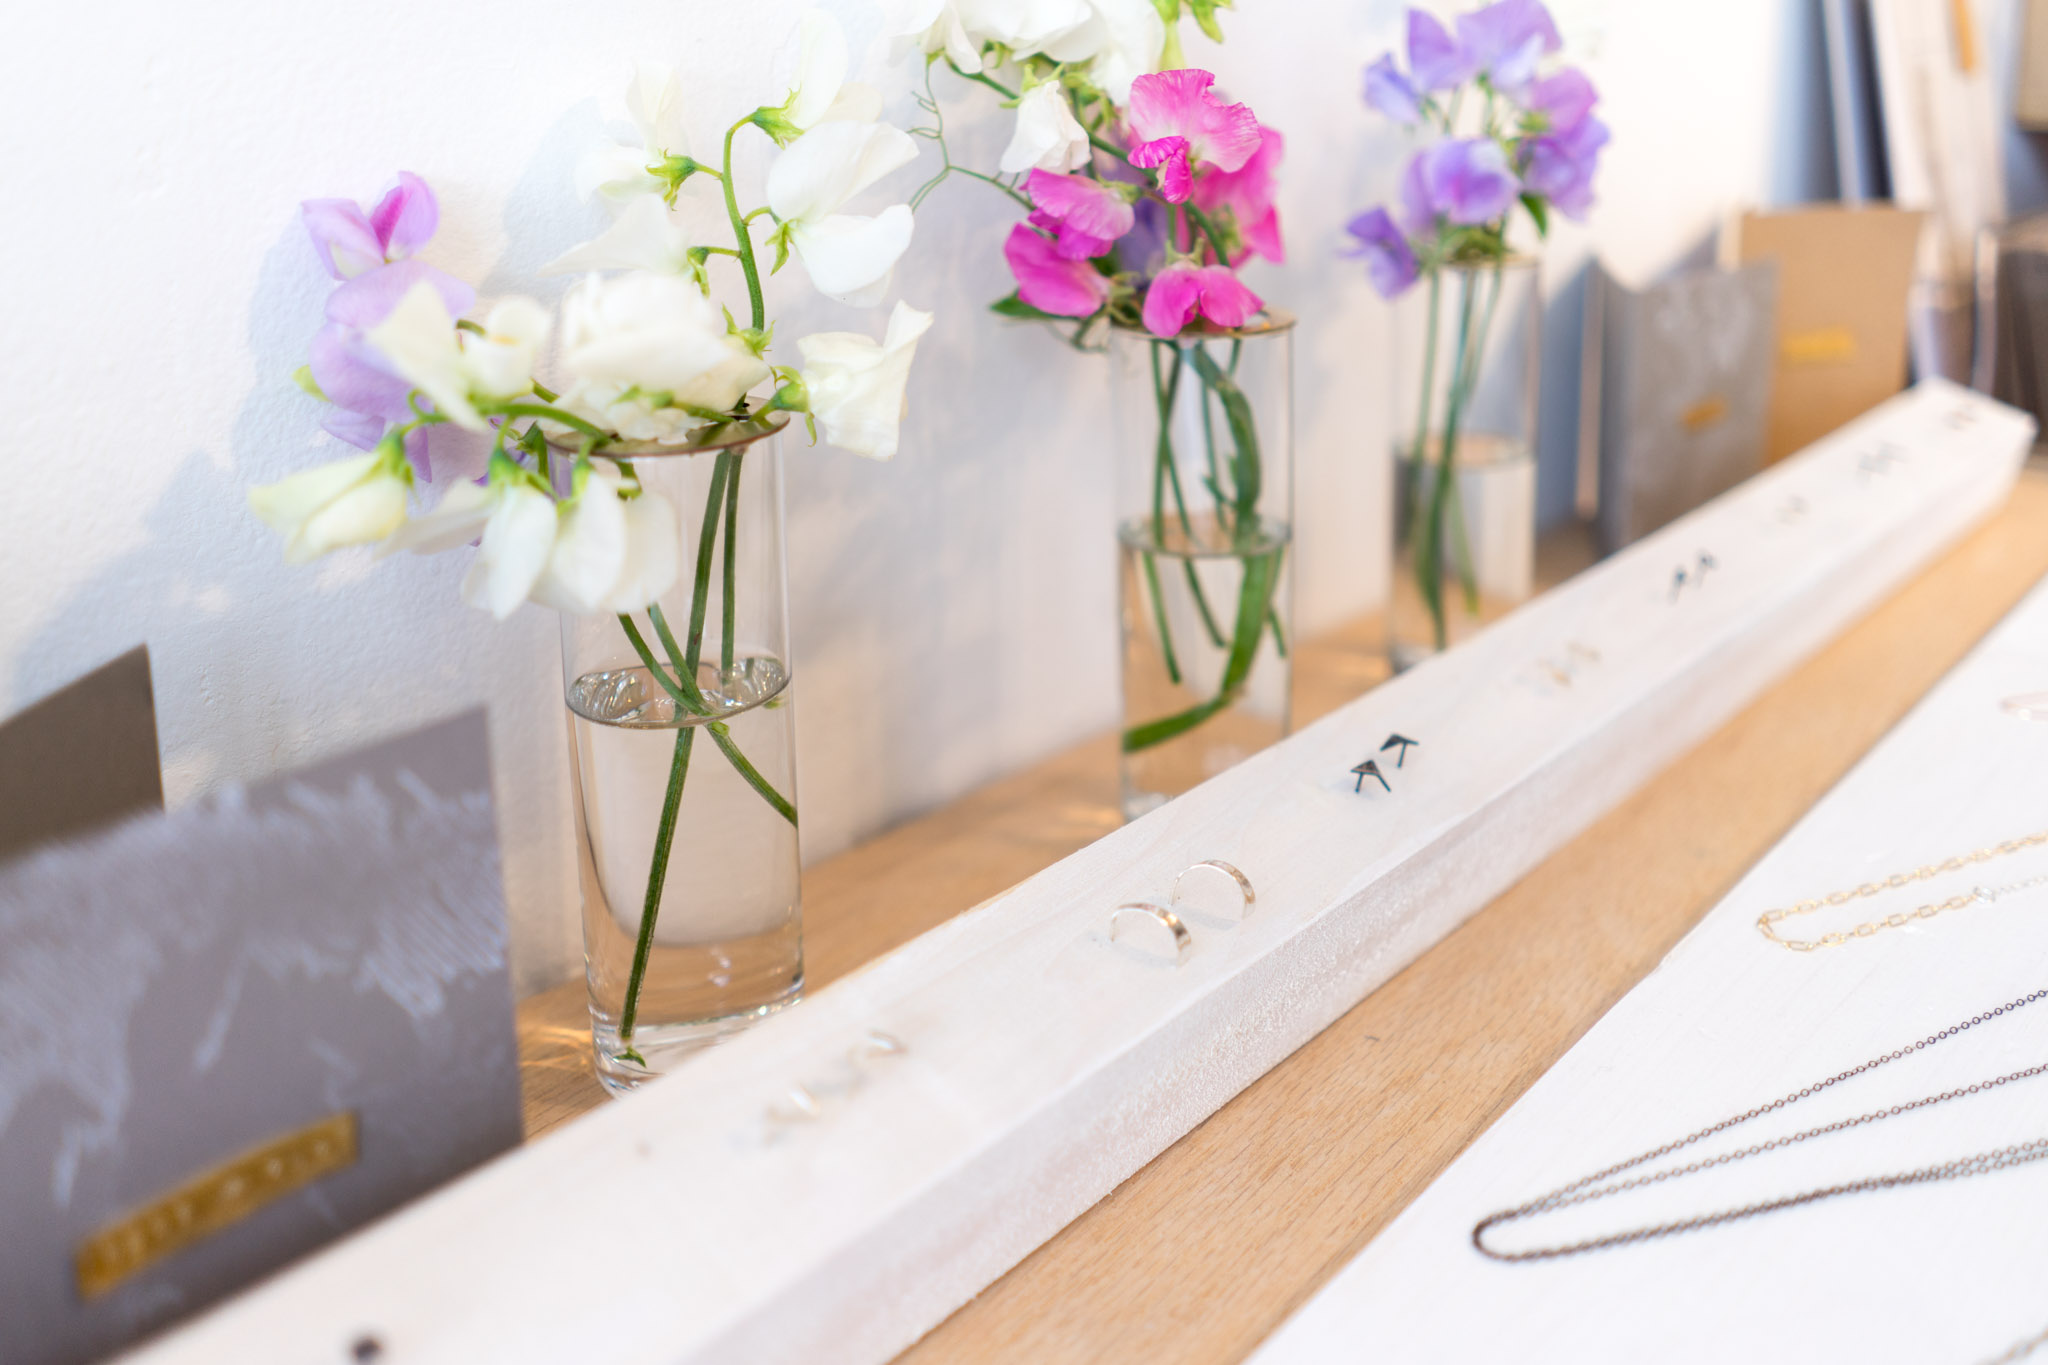 Blume Whistle-01203.jpg